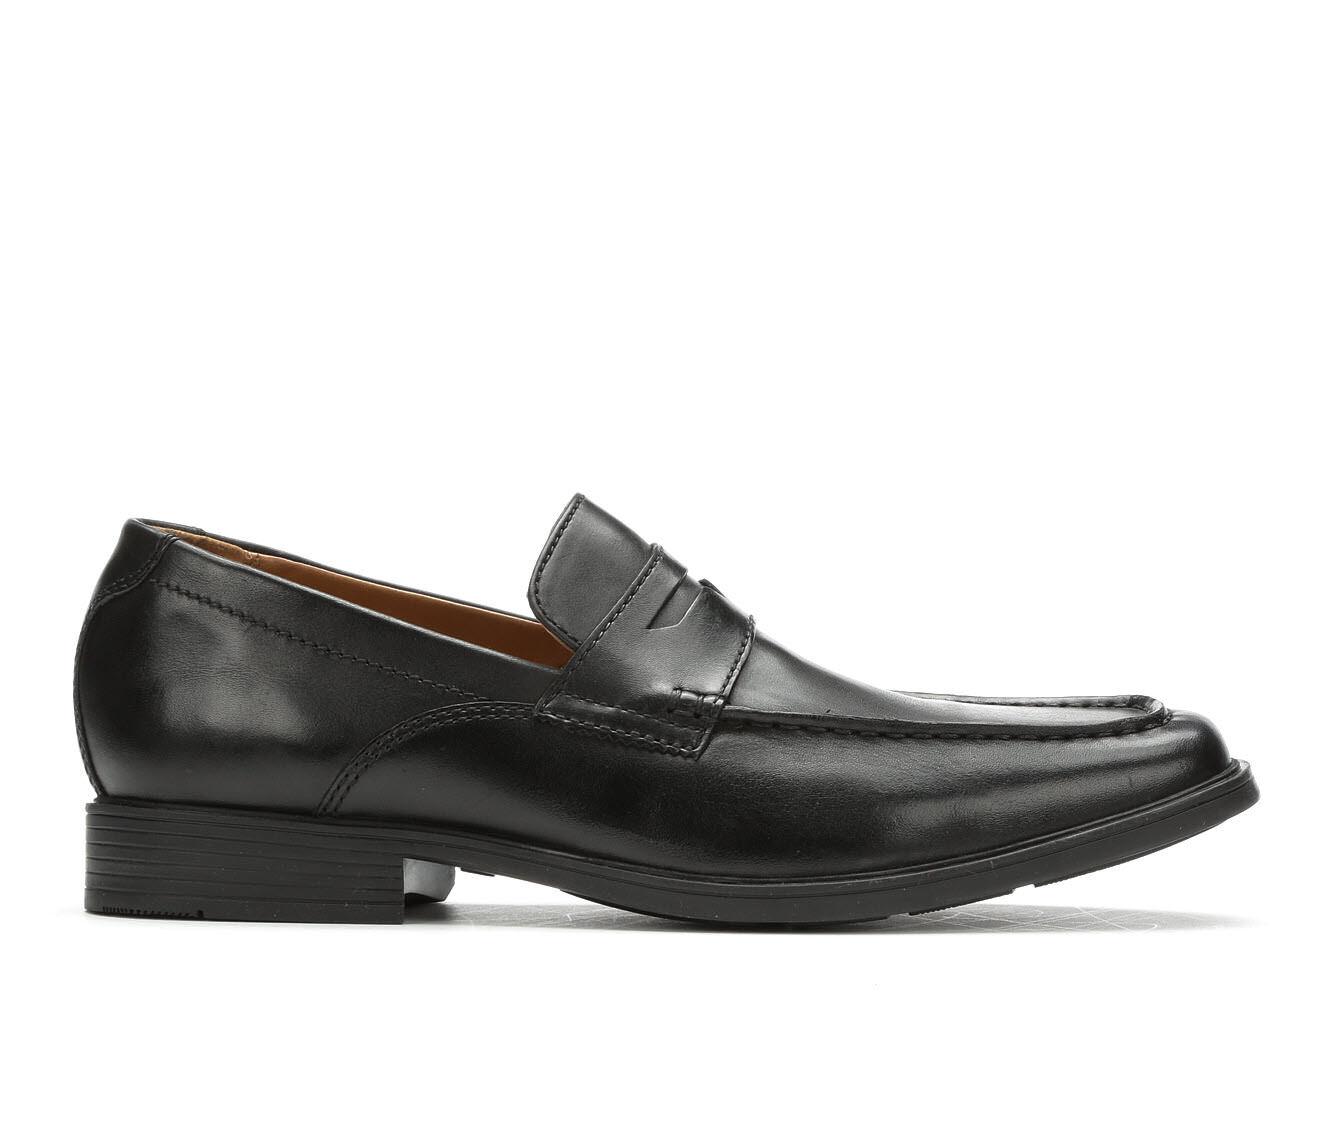 Men's Clarks Tilden Way Slip On Penny Loafers Black